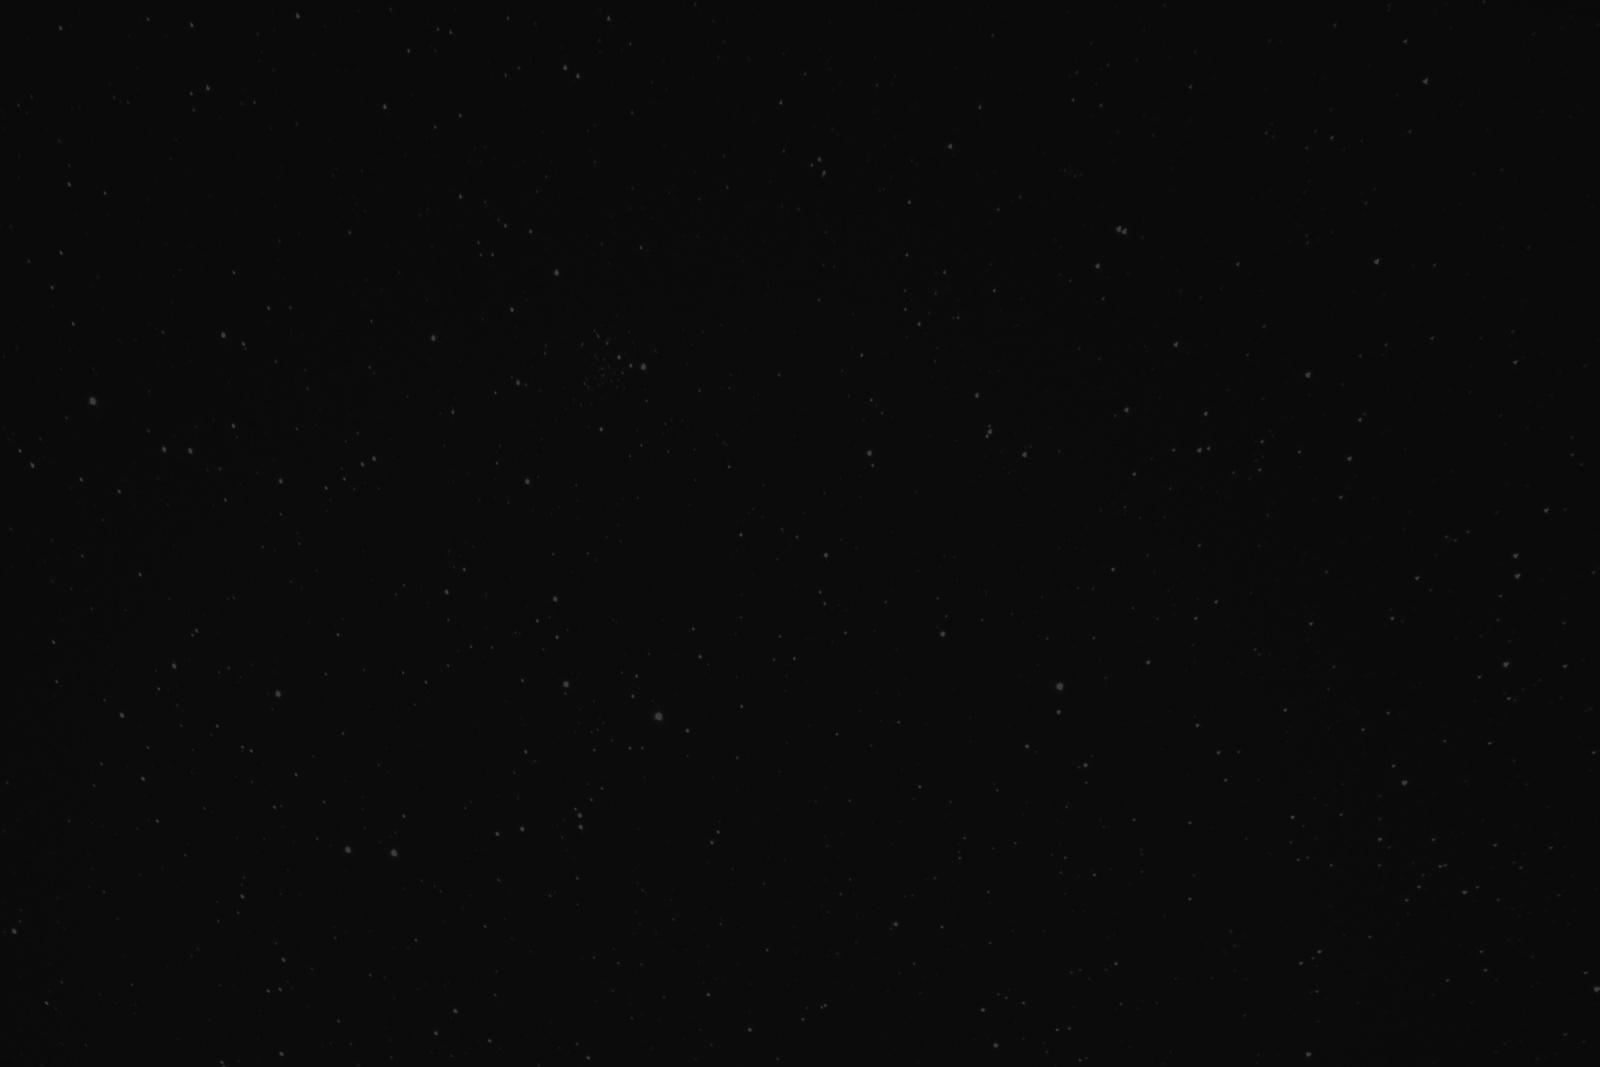 NGC_2266_Light_300_secs_001.thumb.jpg.2c284968f95e3945bd2e4ddb33bfff1b.jpg